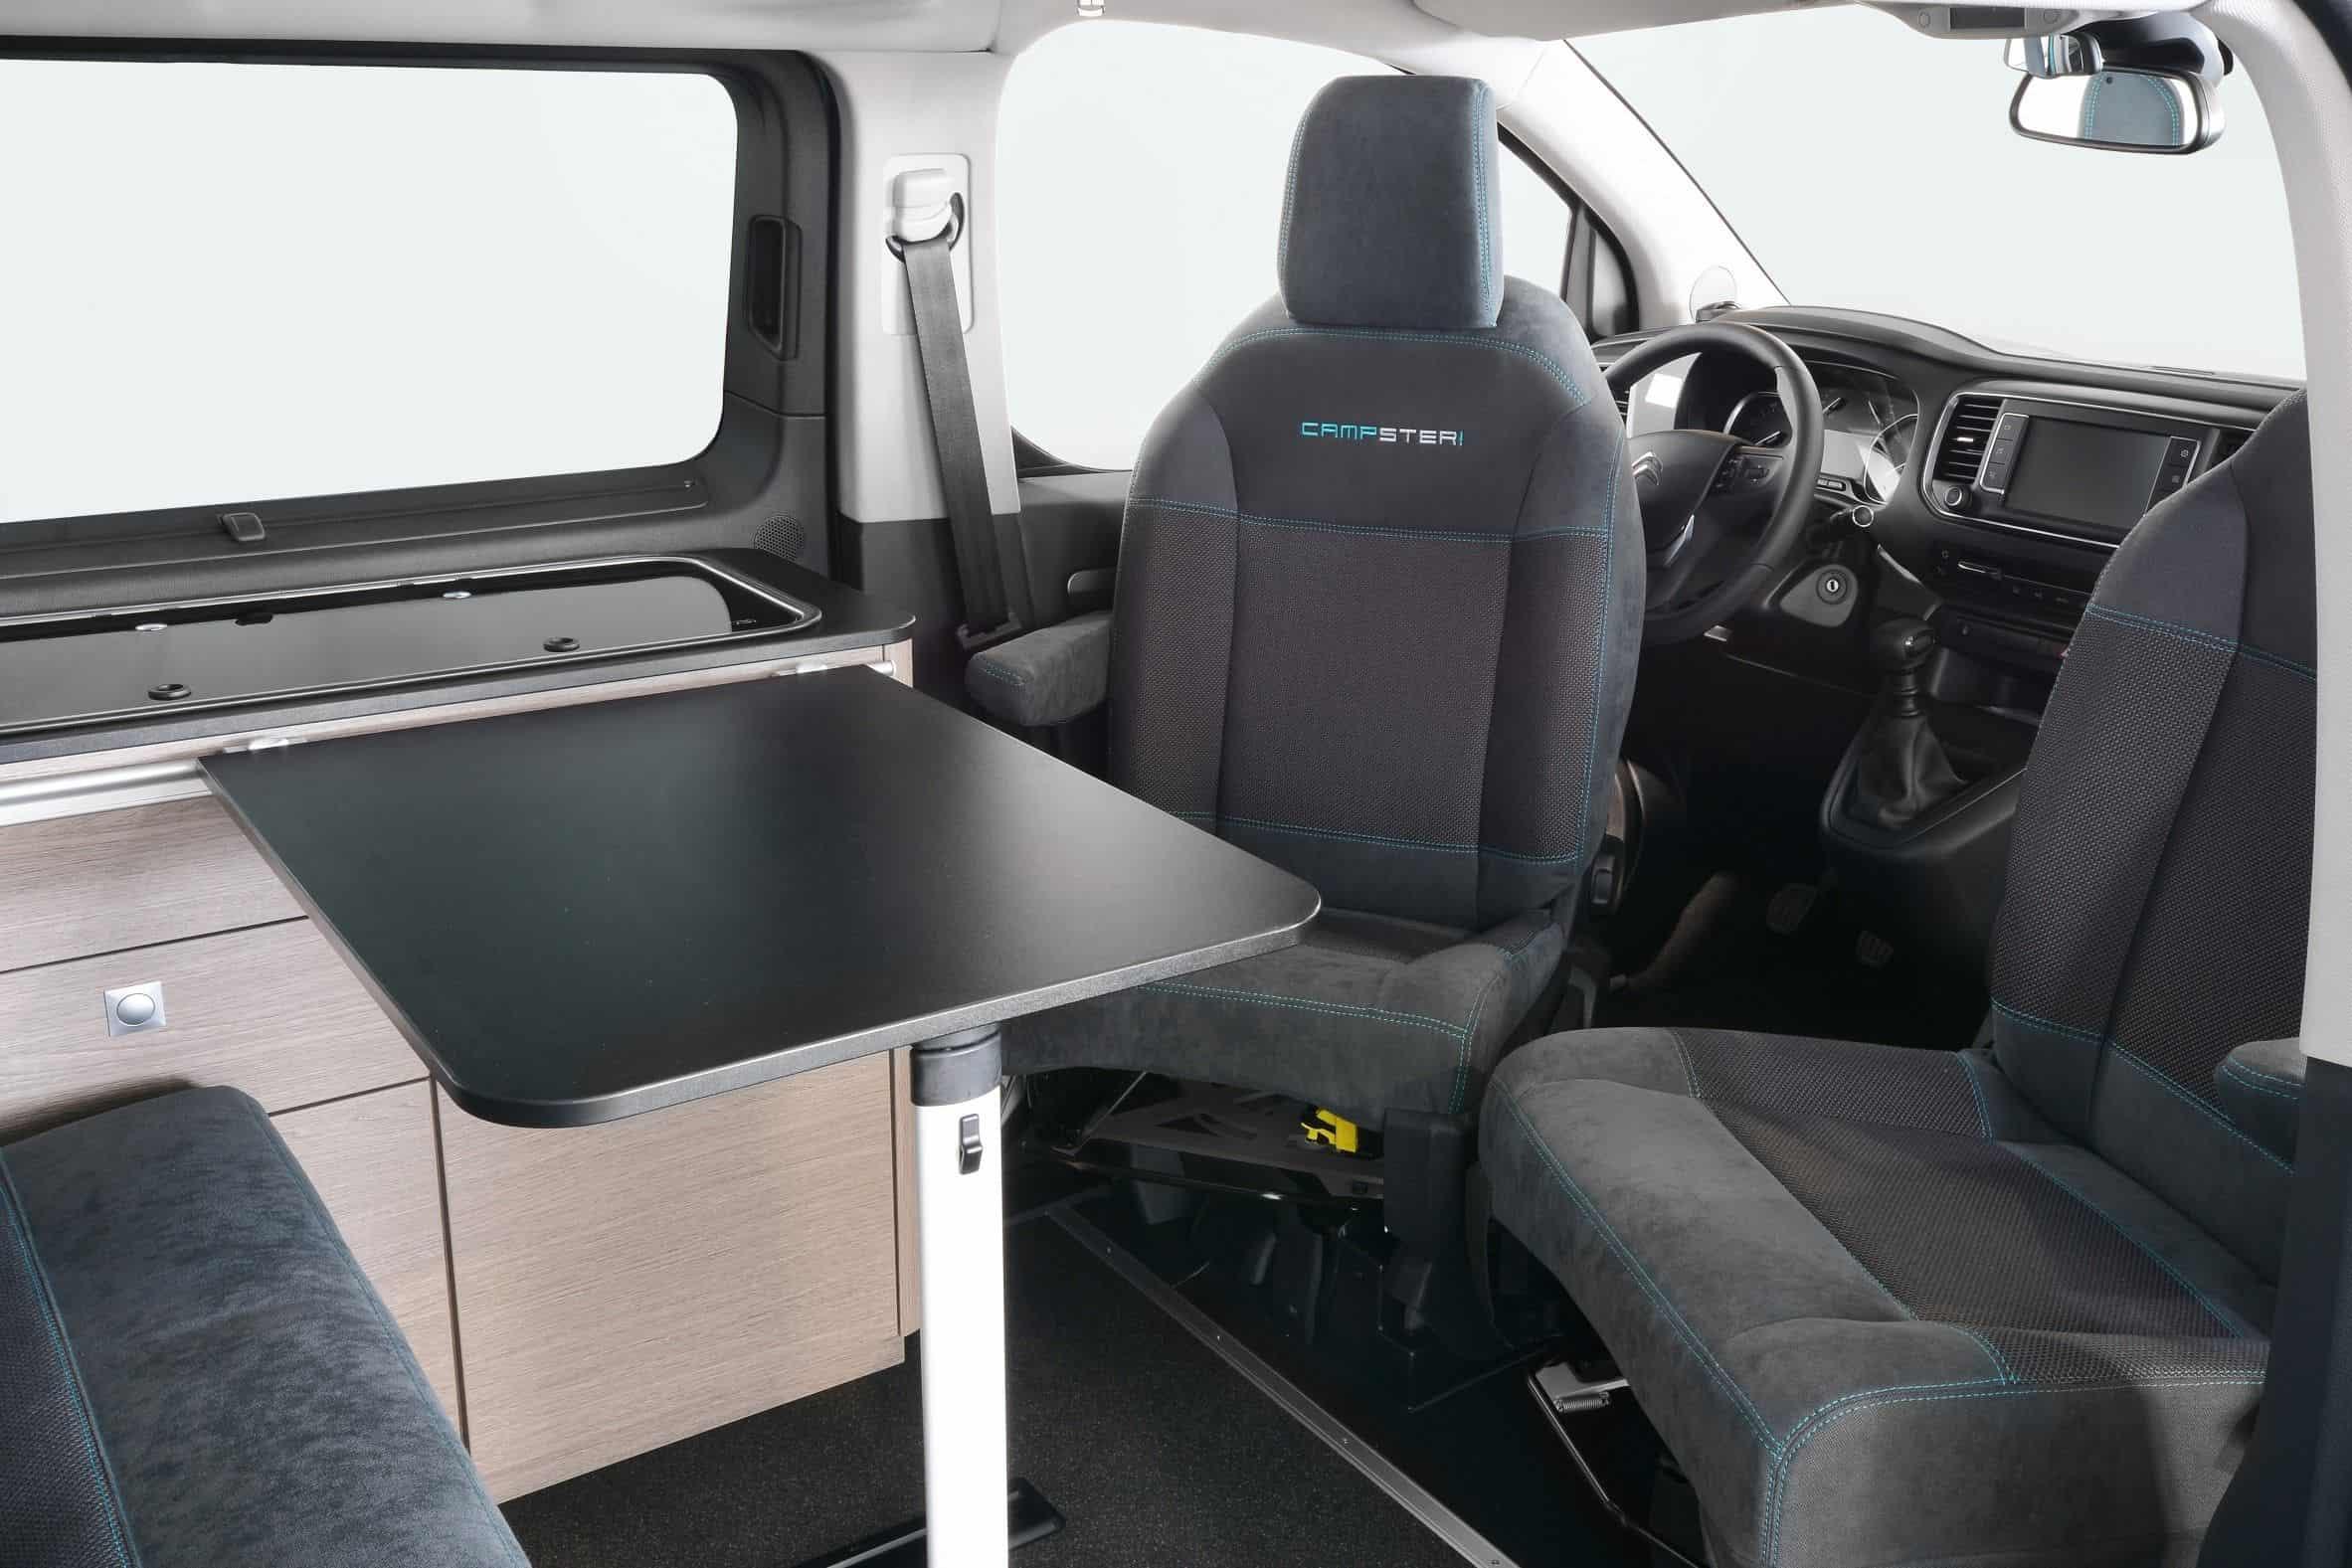 weltpremiere des citro n p ssl campster auf dem caravan salon der. Black Bedroom Furniture Sets. Home Design Ideas